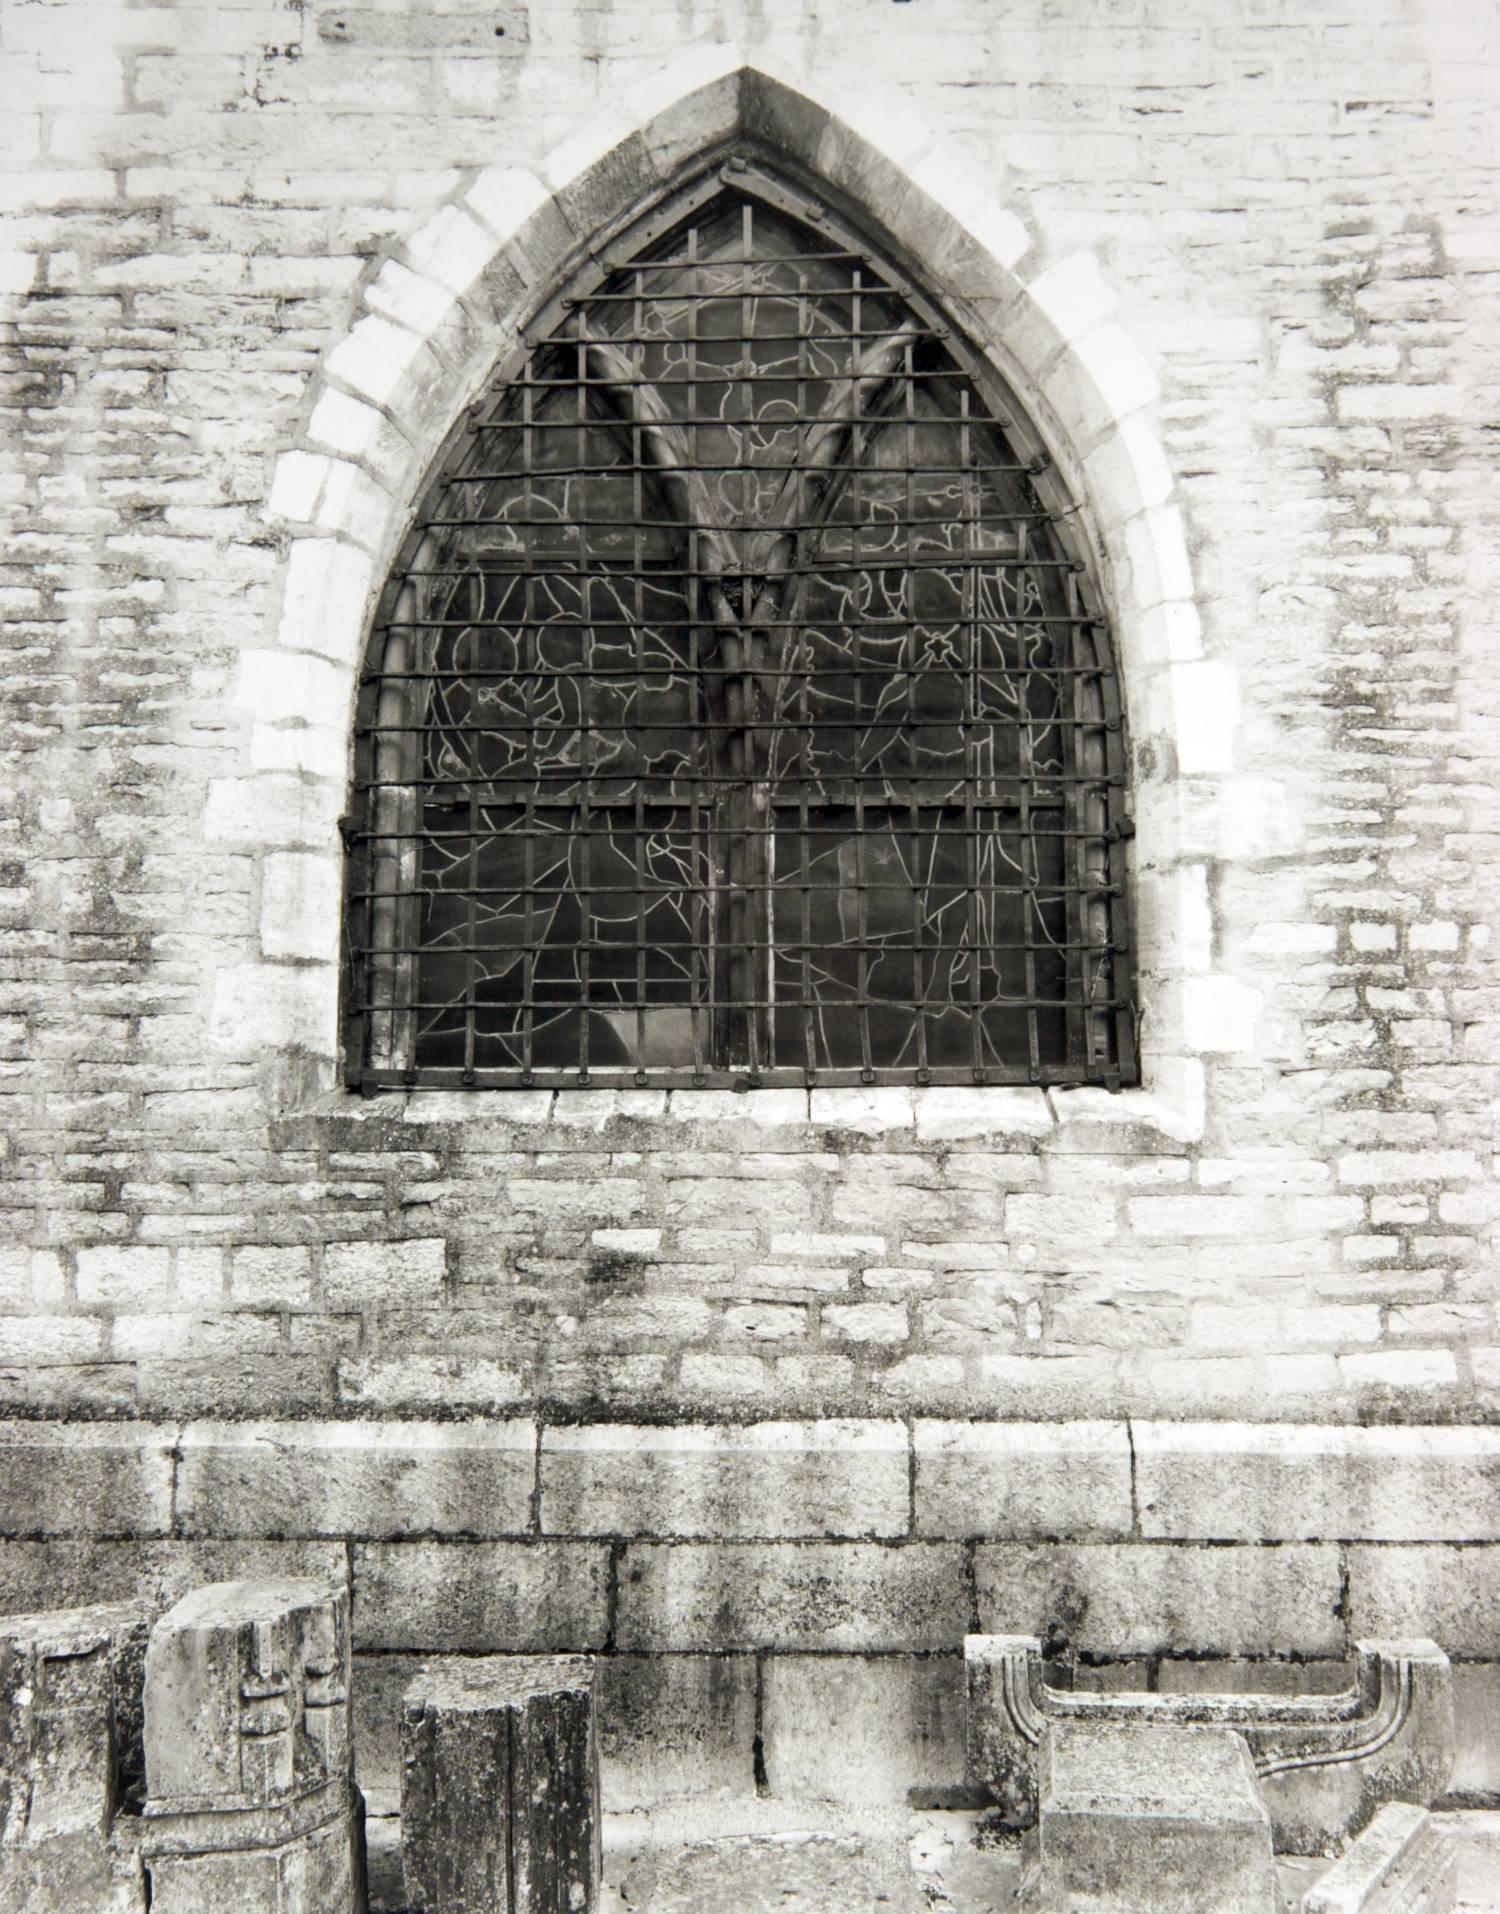 Window with Stones (Basilique Notre Dame, Beaune, France)